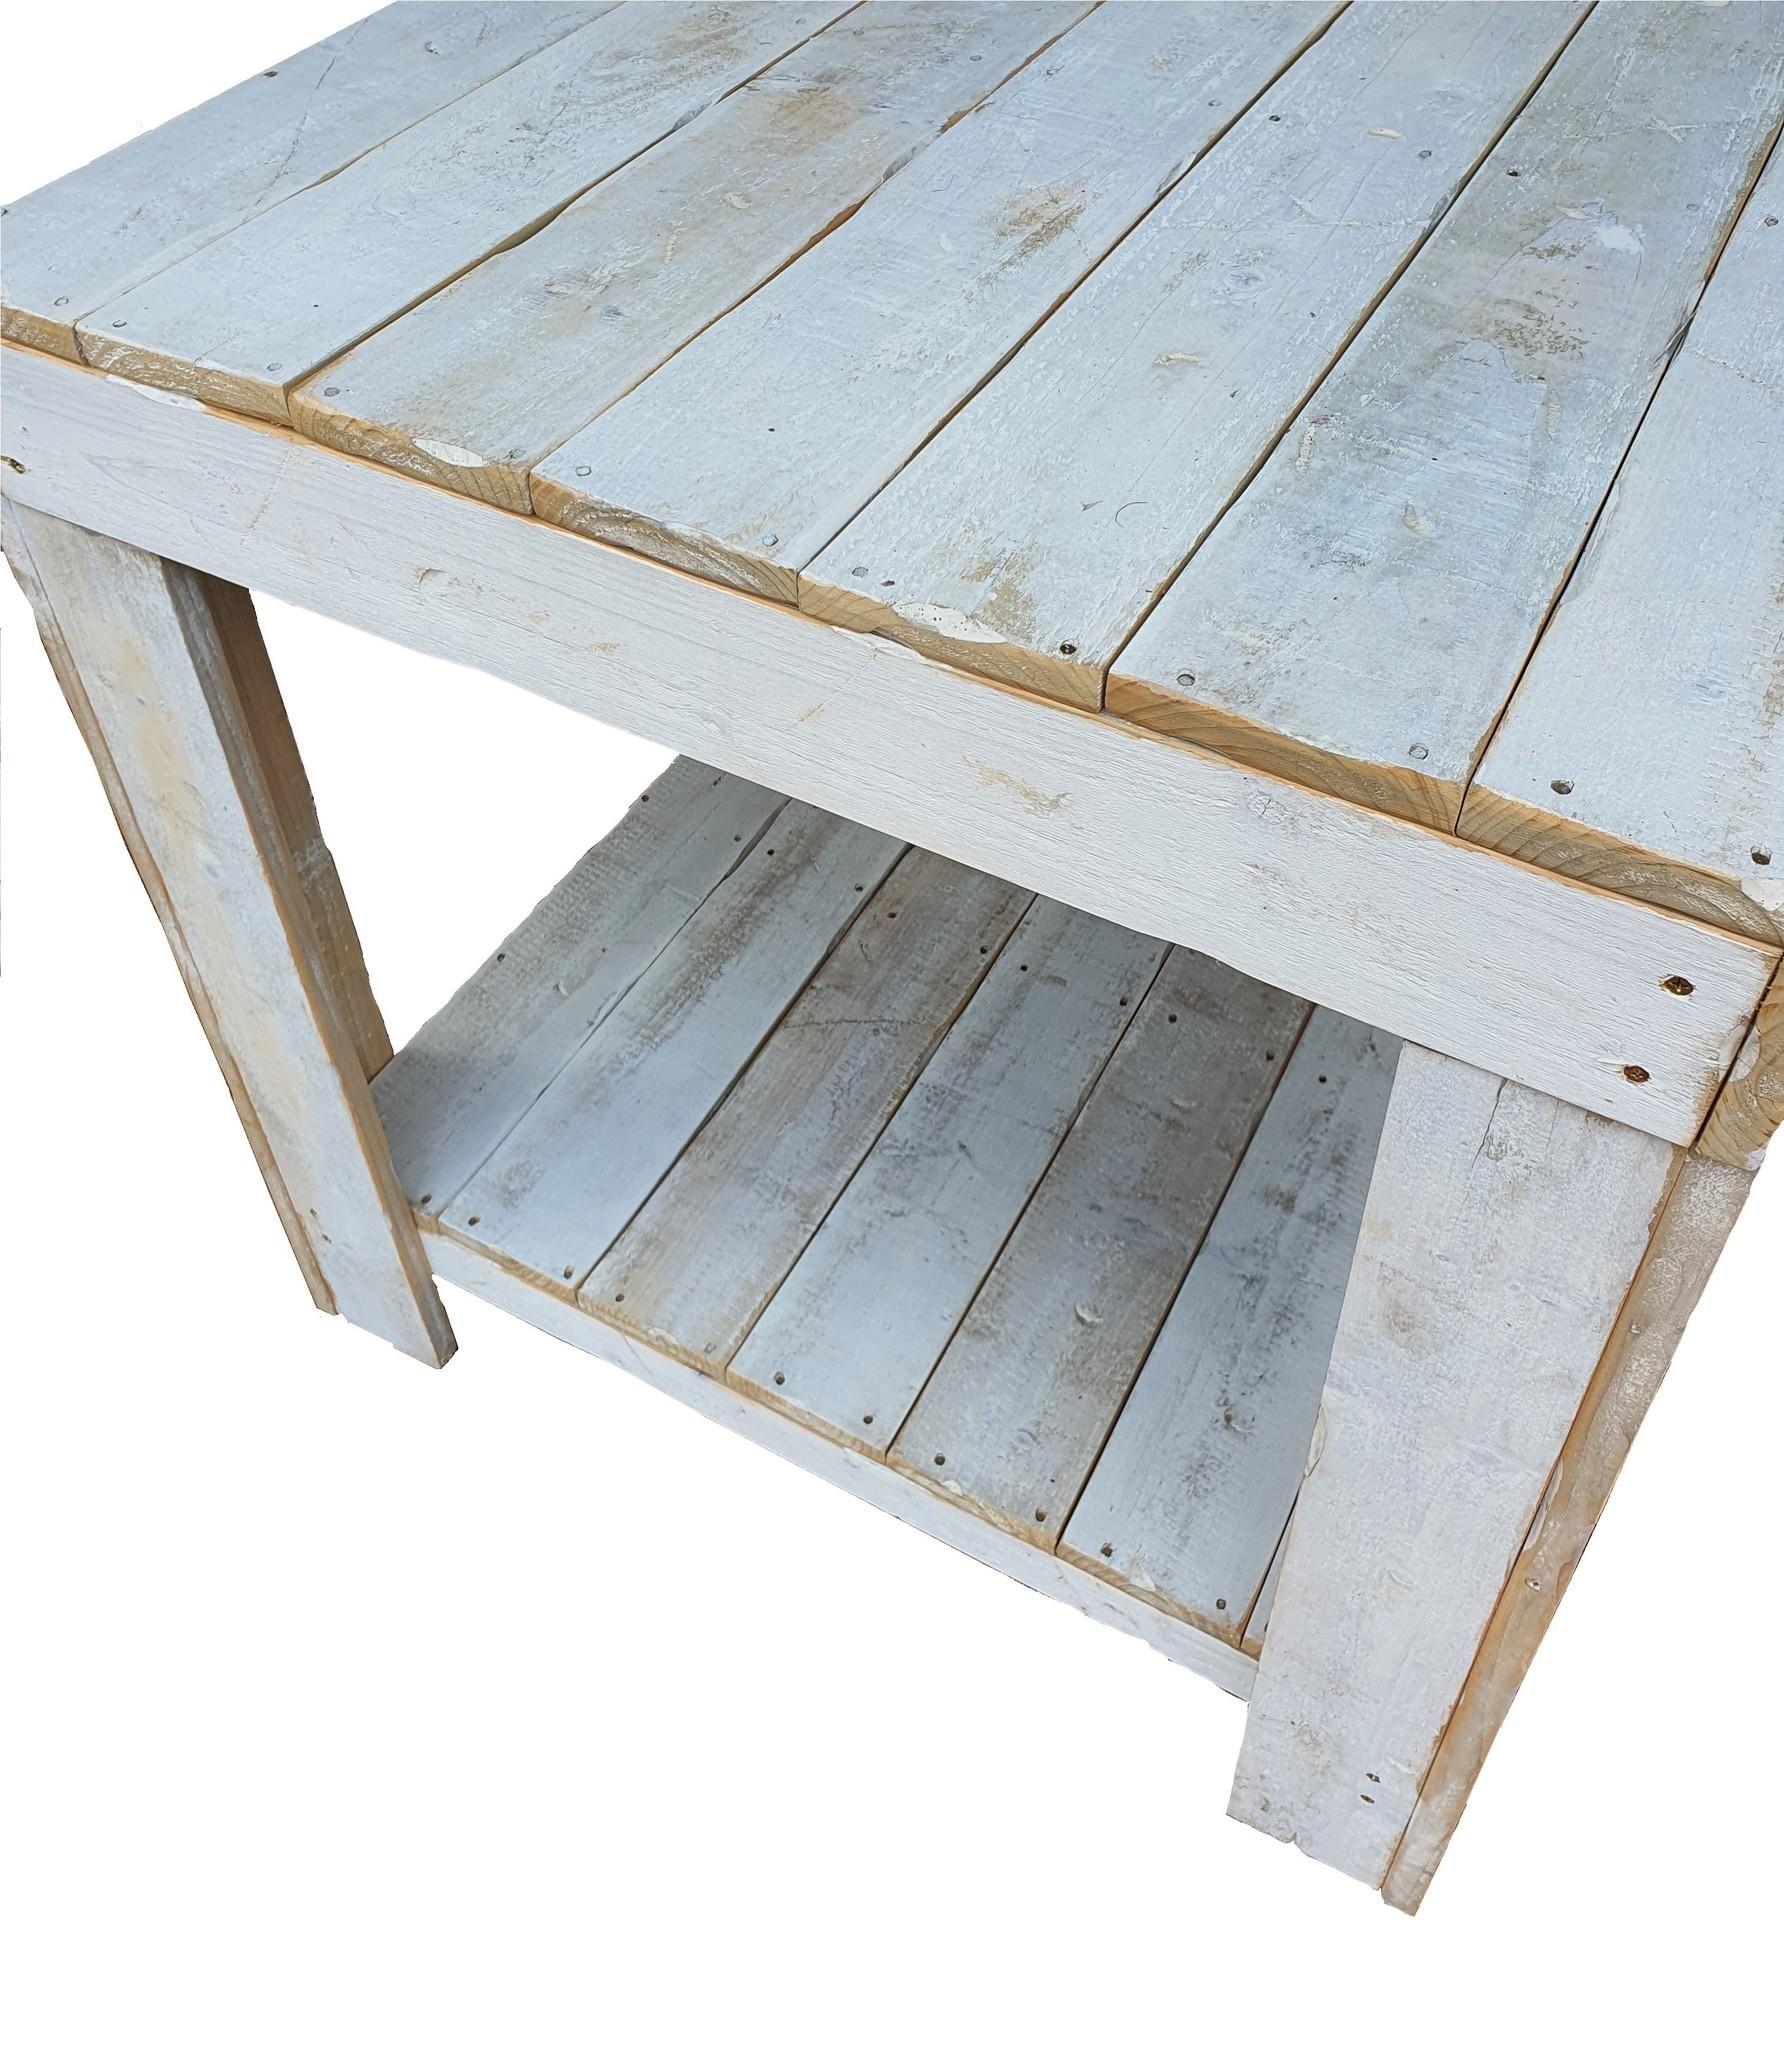 shop int ibiza white table double 110-3